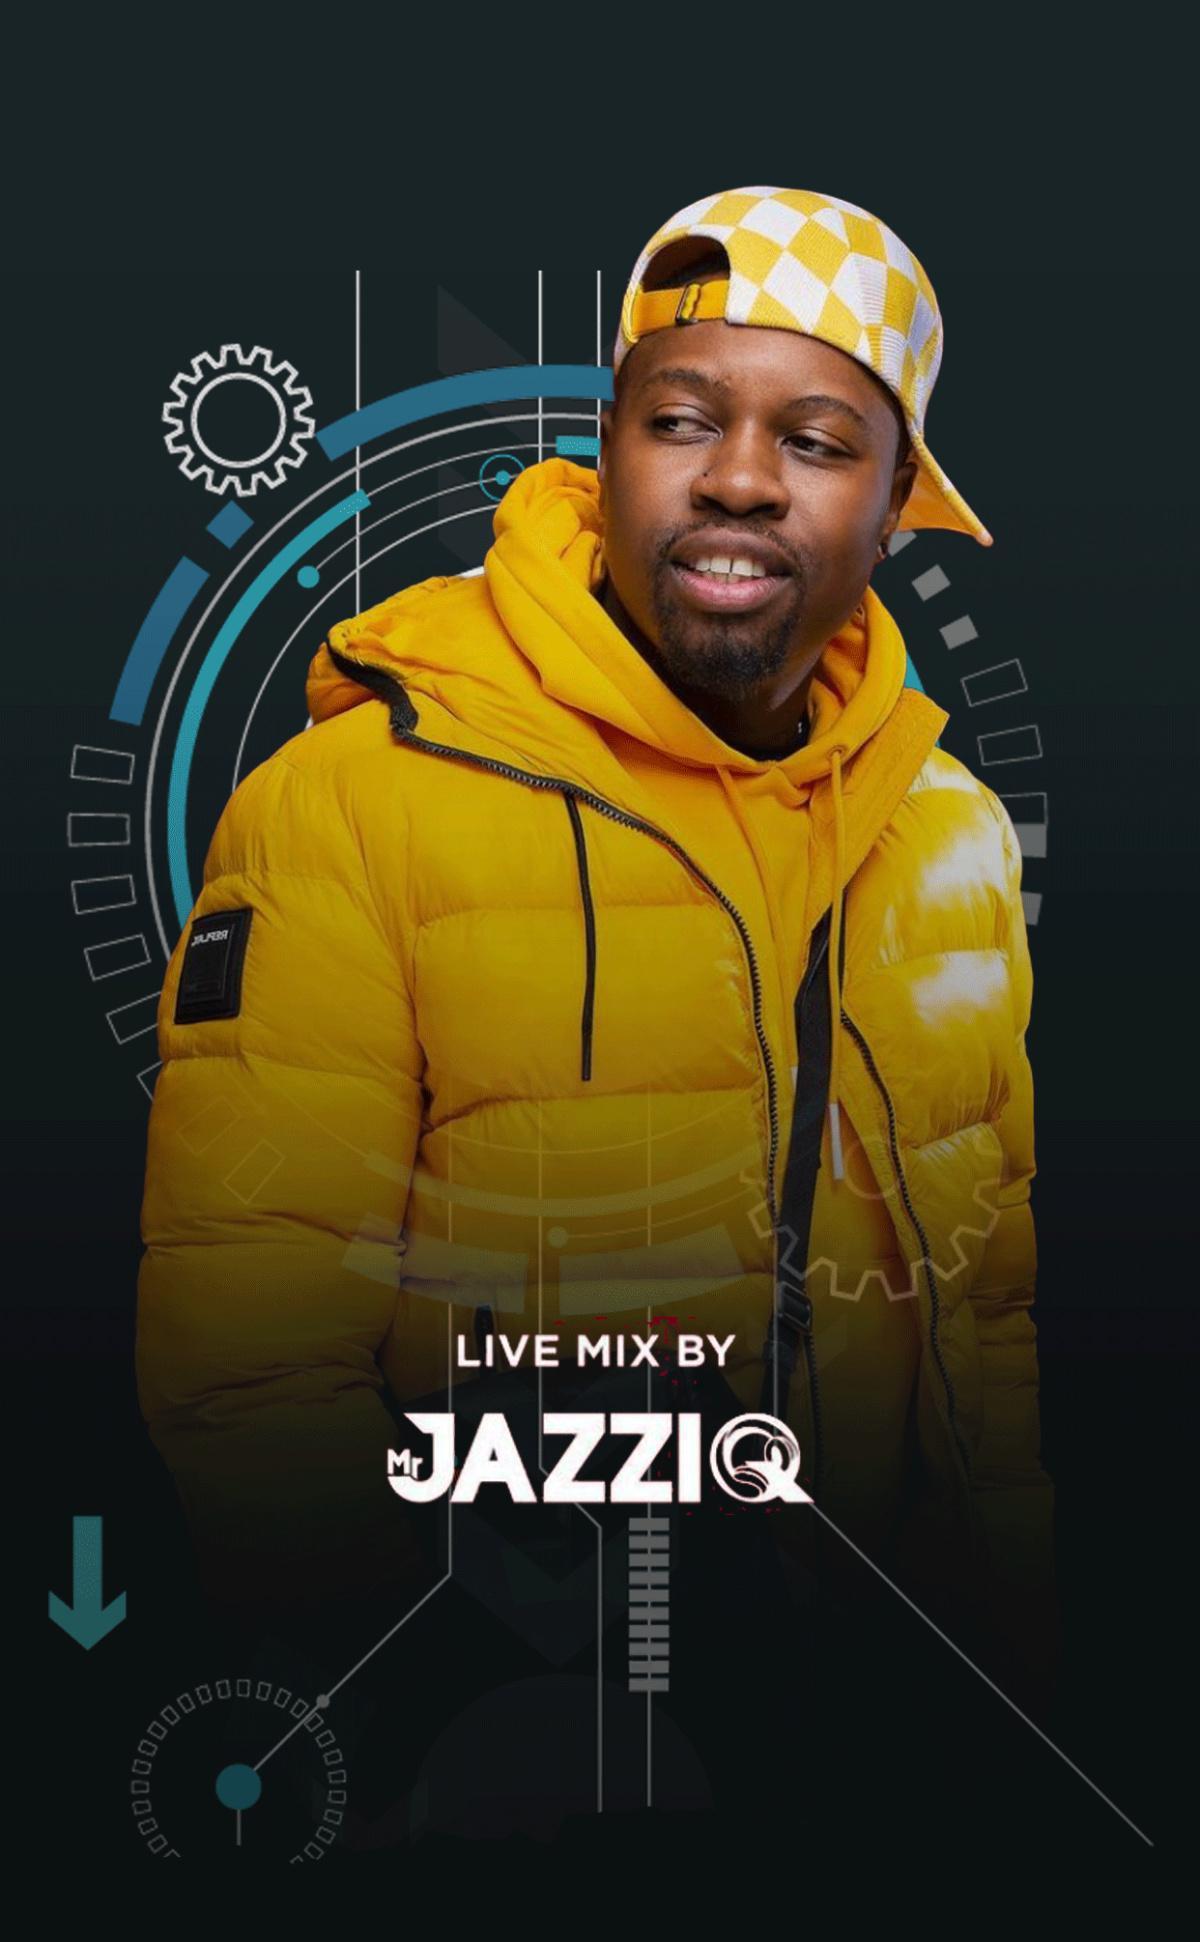 Mr. JazziQ Operates Something